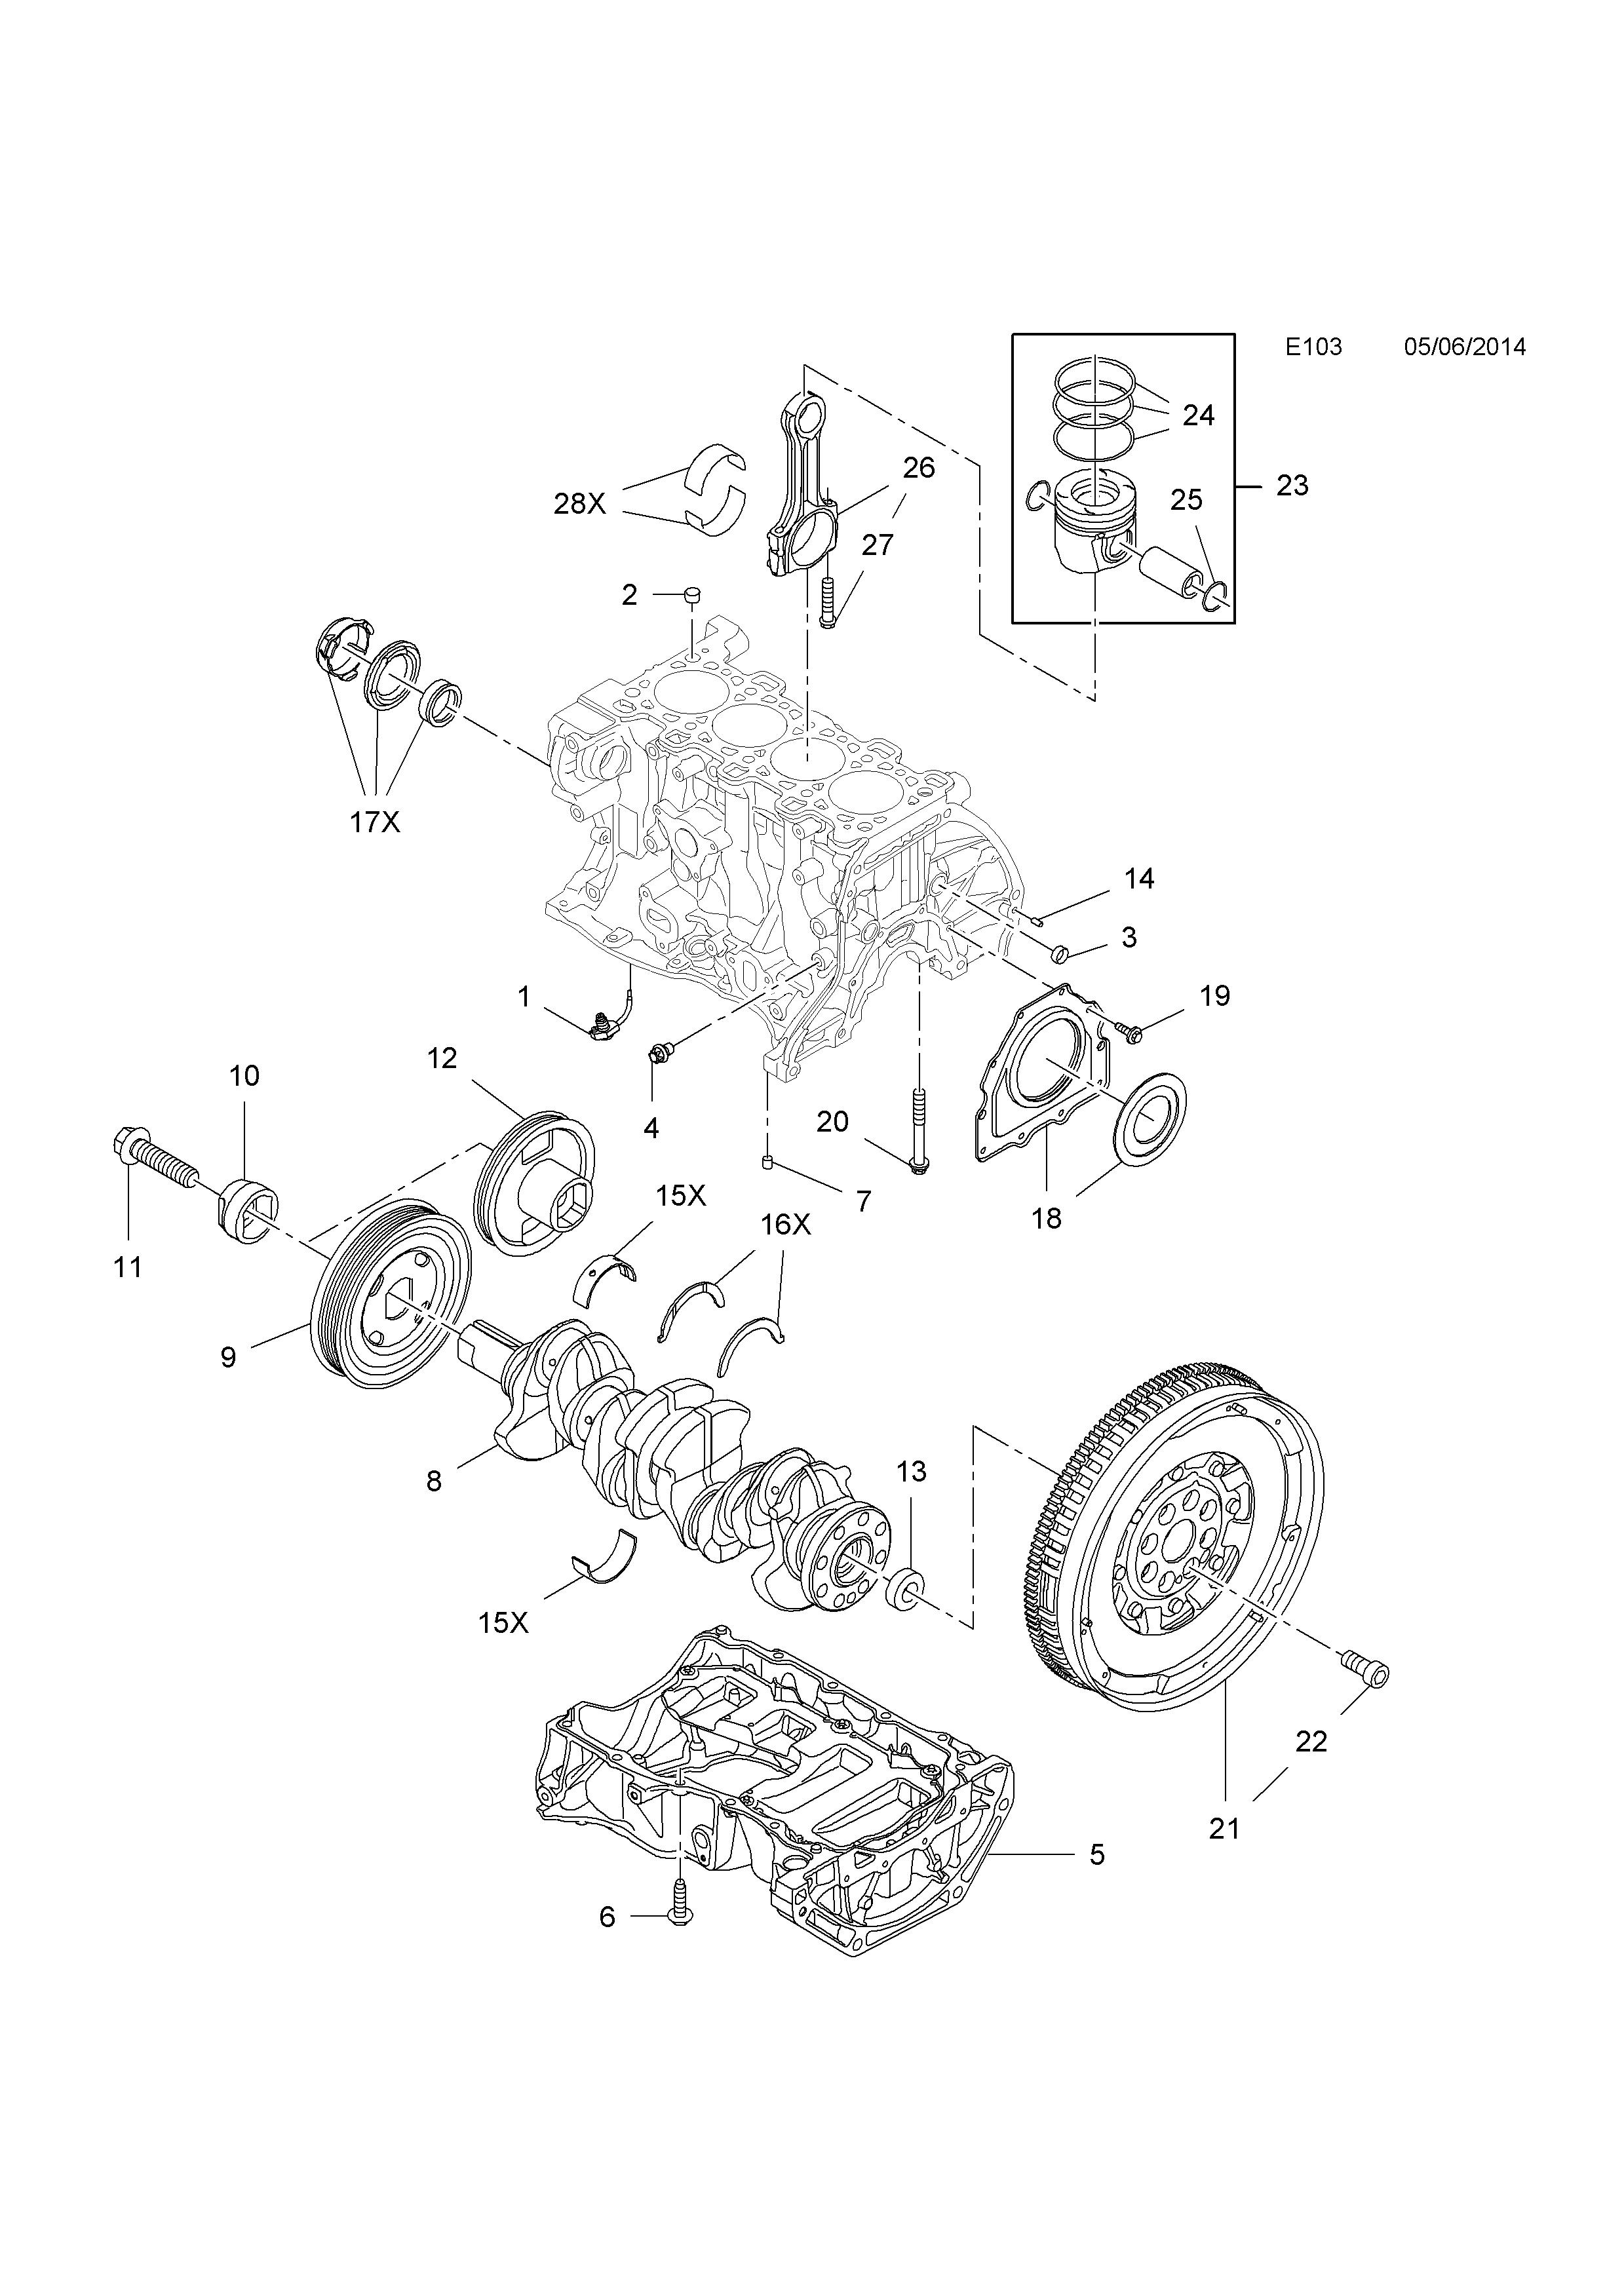 opel vivaro b 2015 e engine and clutch 1 16d r9m ma mb mc 1964 Opel GT list of parts